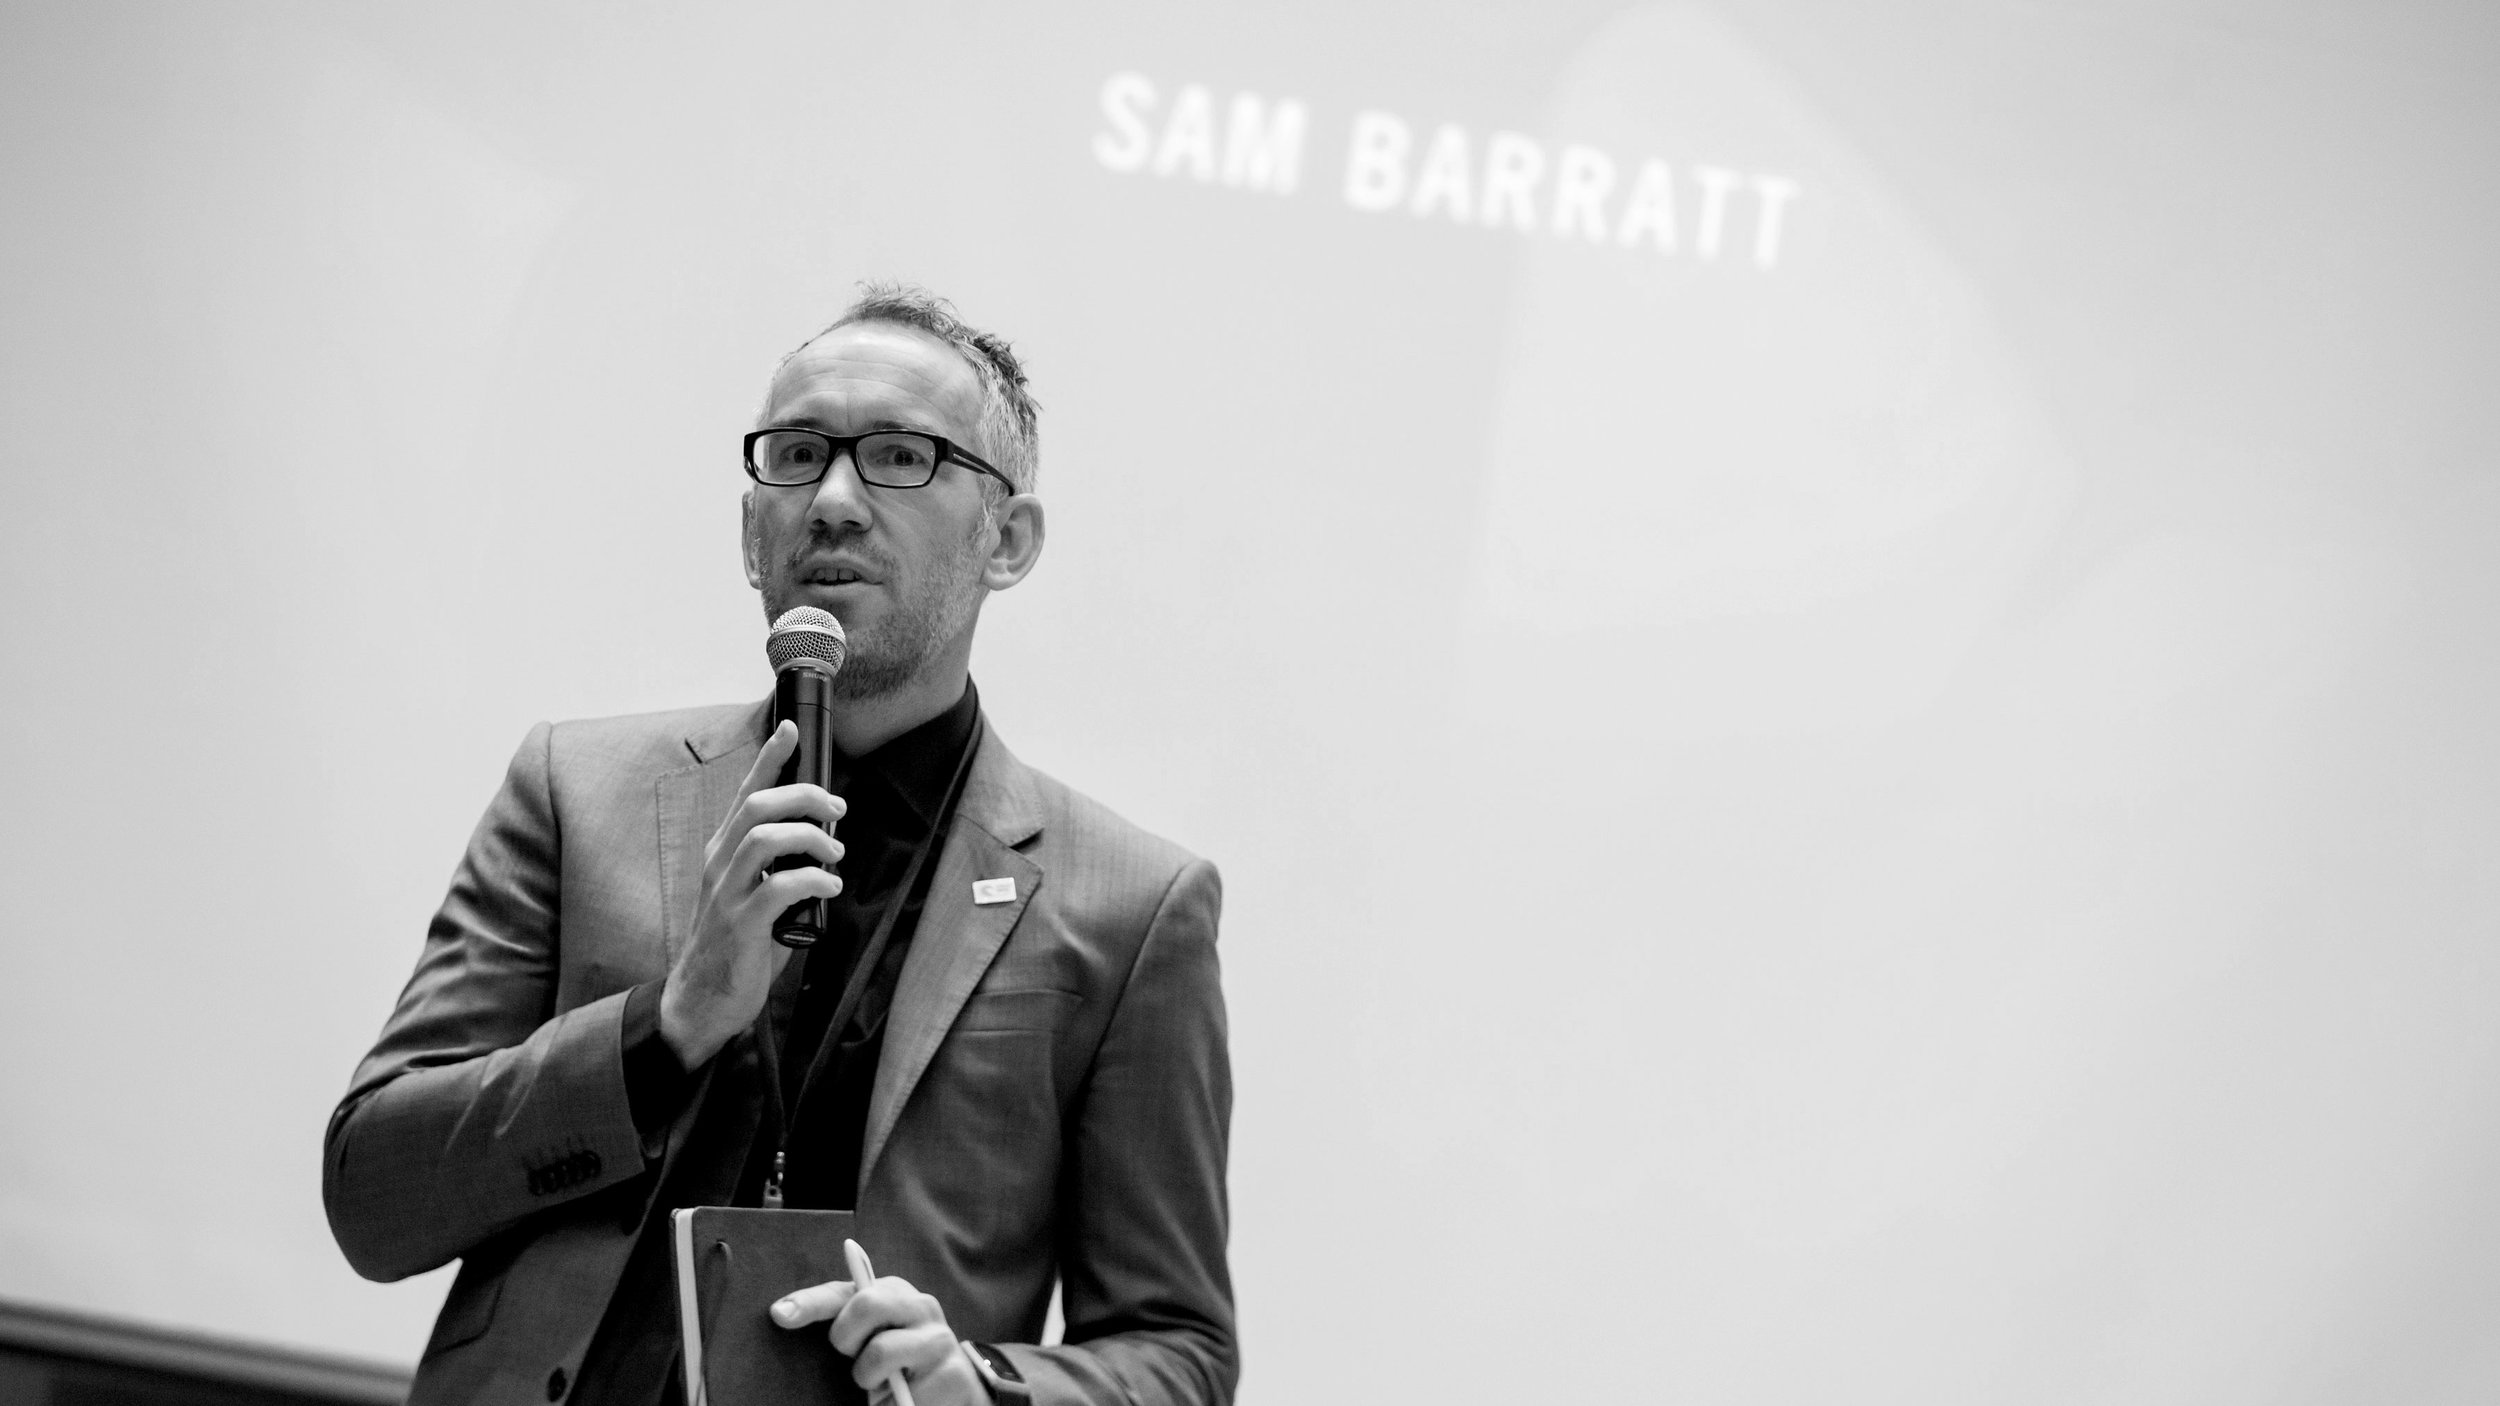 Sam Barratt, UN Environment Programme's Chief of Public Advocacy & Comms